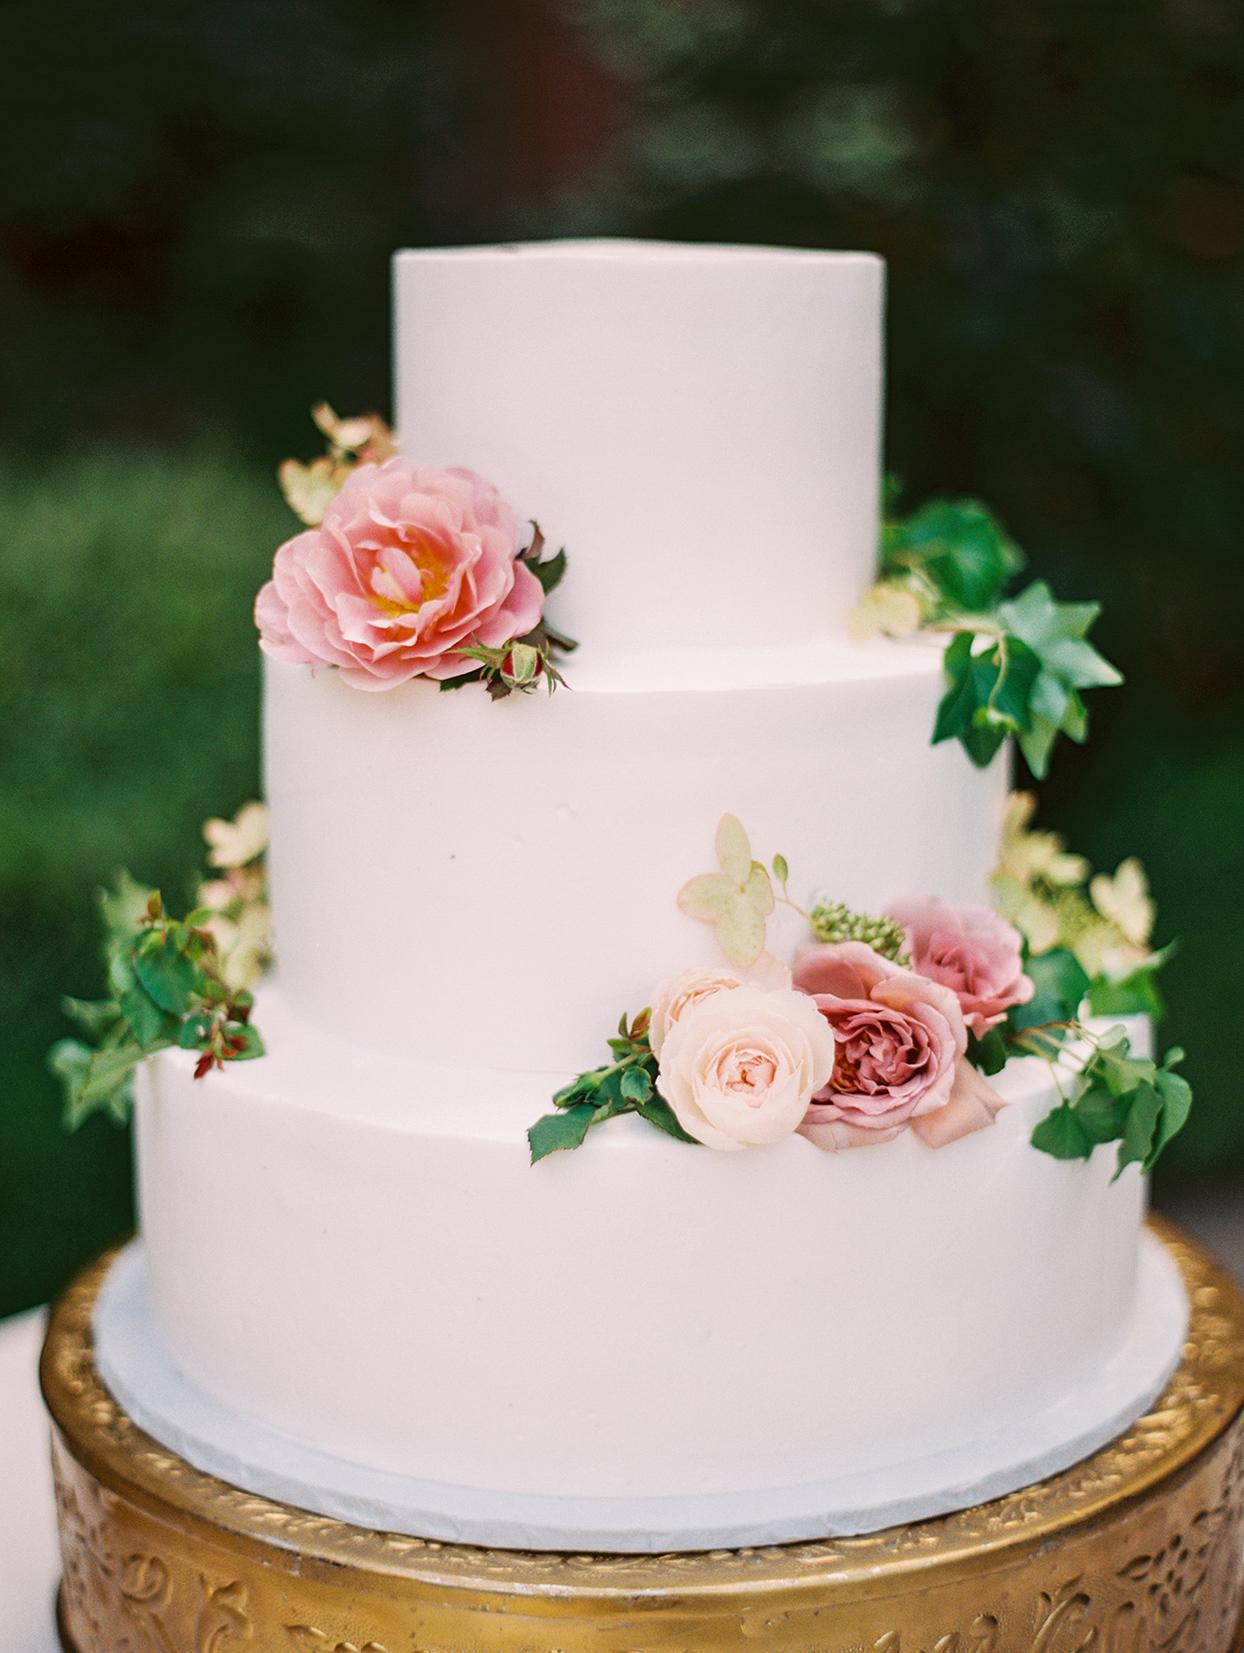 yalda anusha white three tiered wedding cake with pink roses